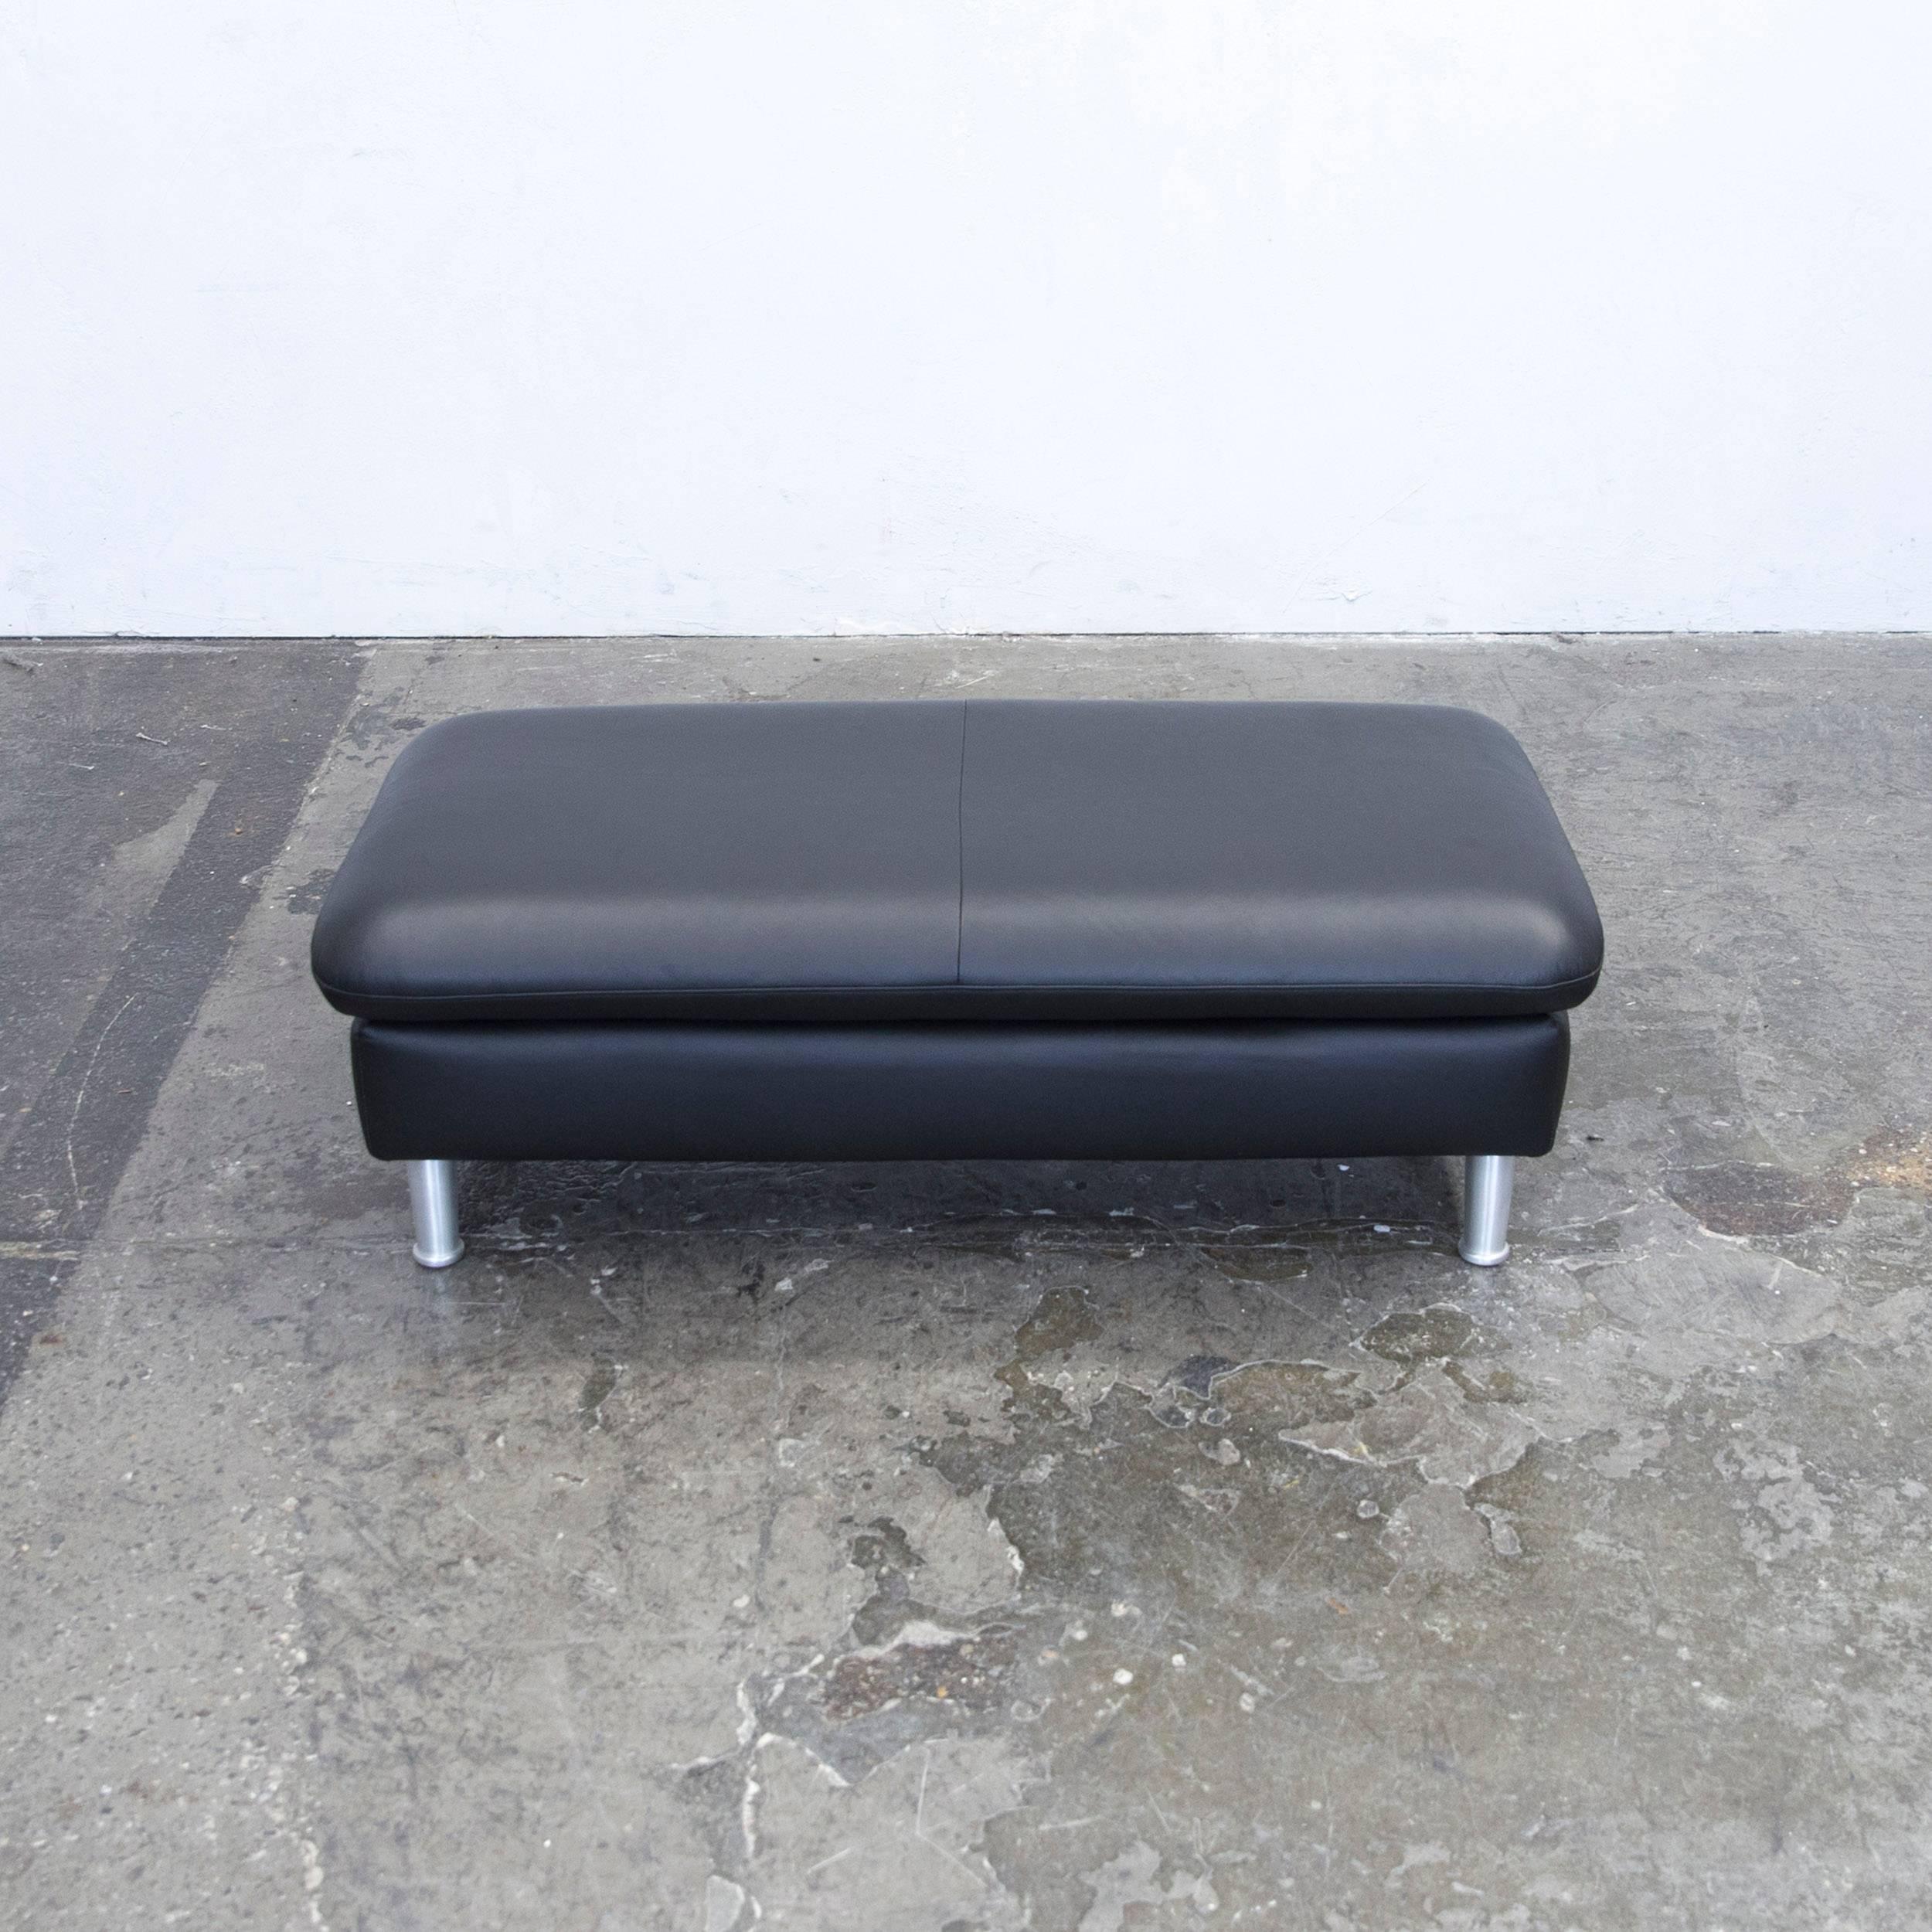 couch hocker schwarz interesting couch hocker schwarz with couch hocker schwarz good pols. Black Bedroom Furniture Sets. Home Design Ideas